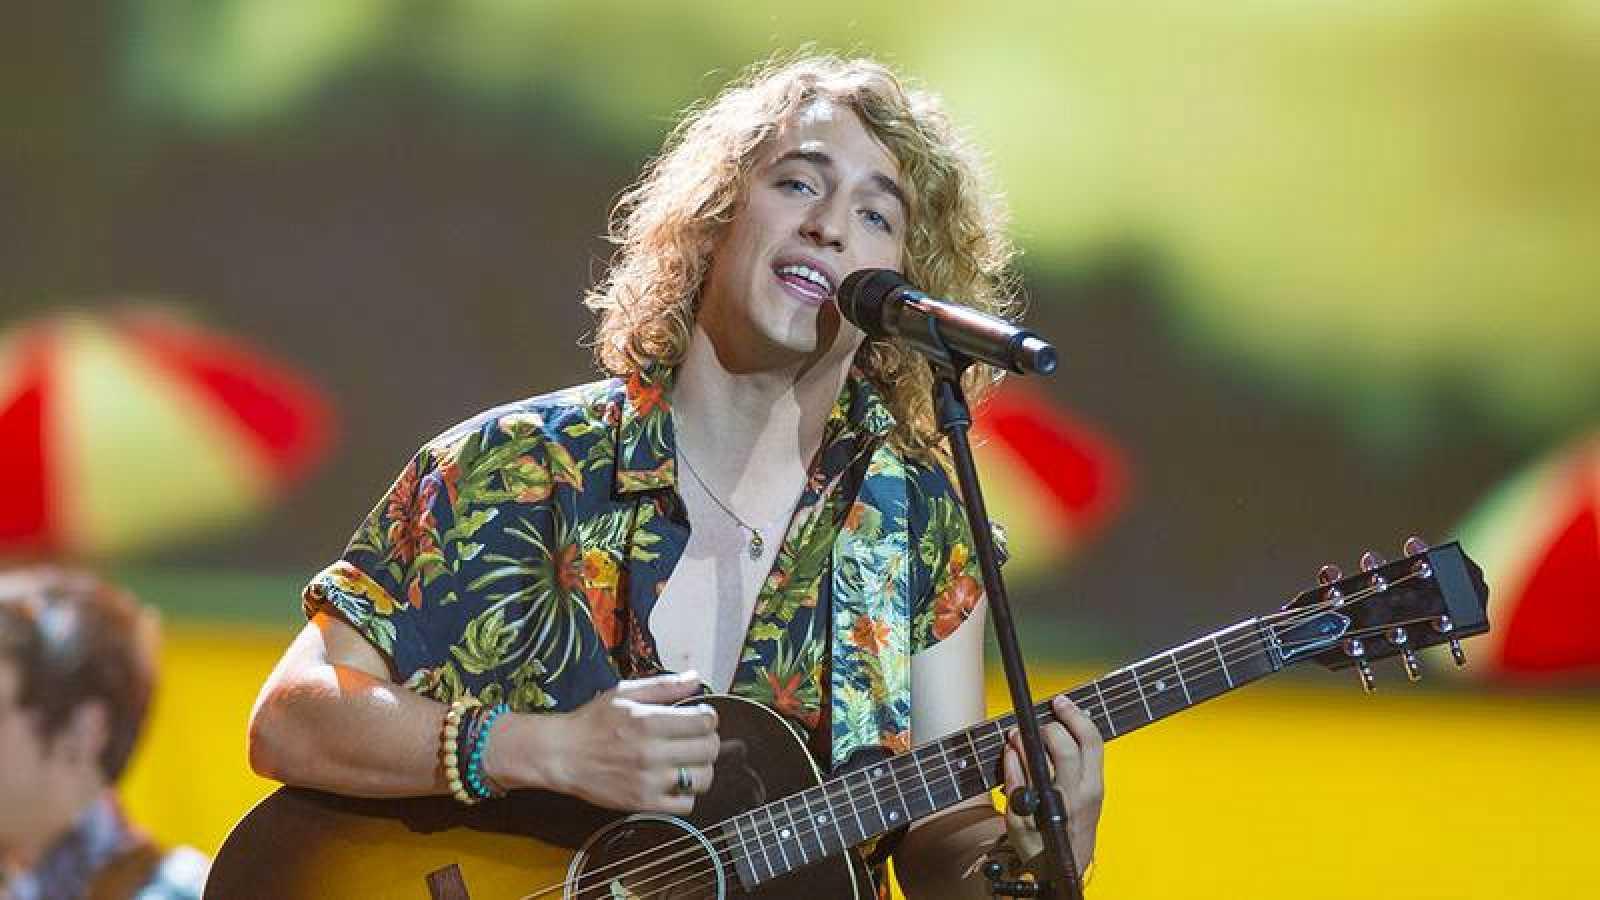 Eurovisión 2017 -Manel Navarro en su segundo ensayo